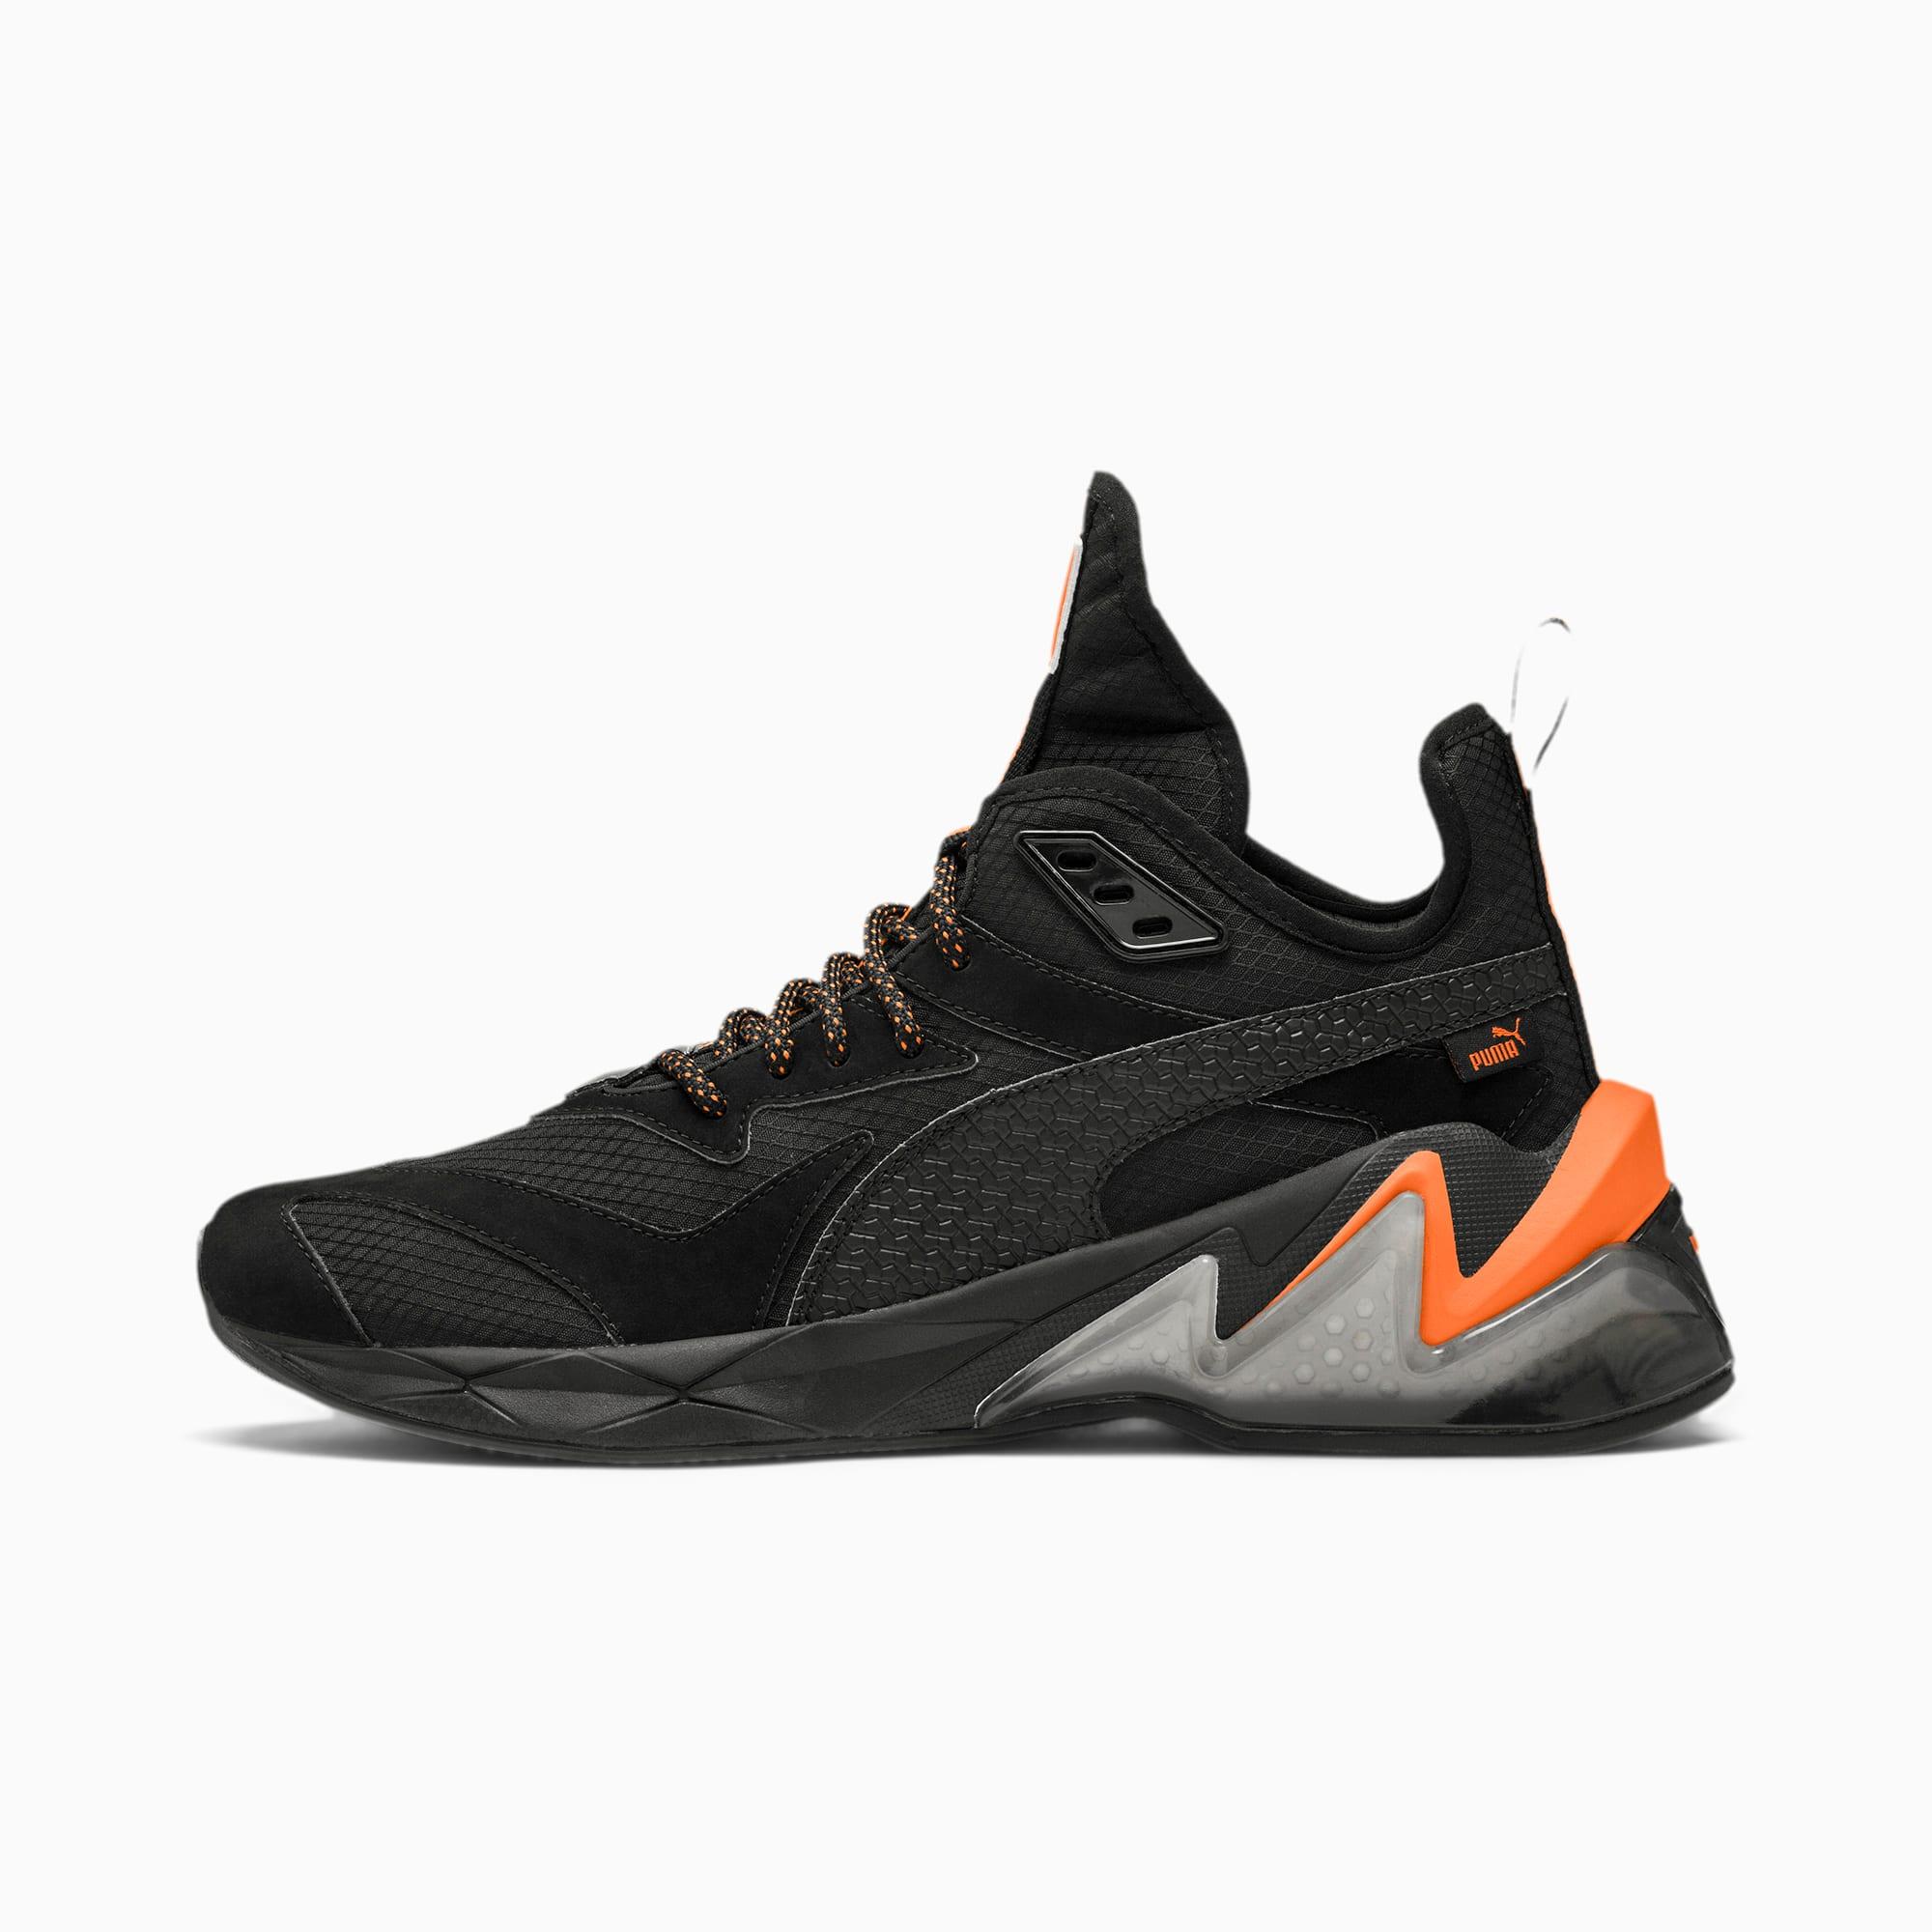 LQDCELL Origin Terrain Men's Training Shoes